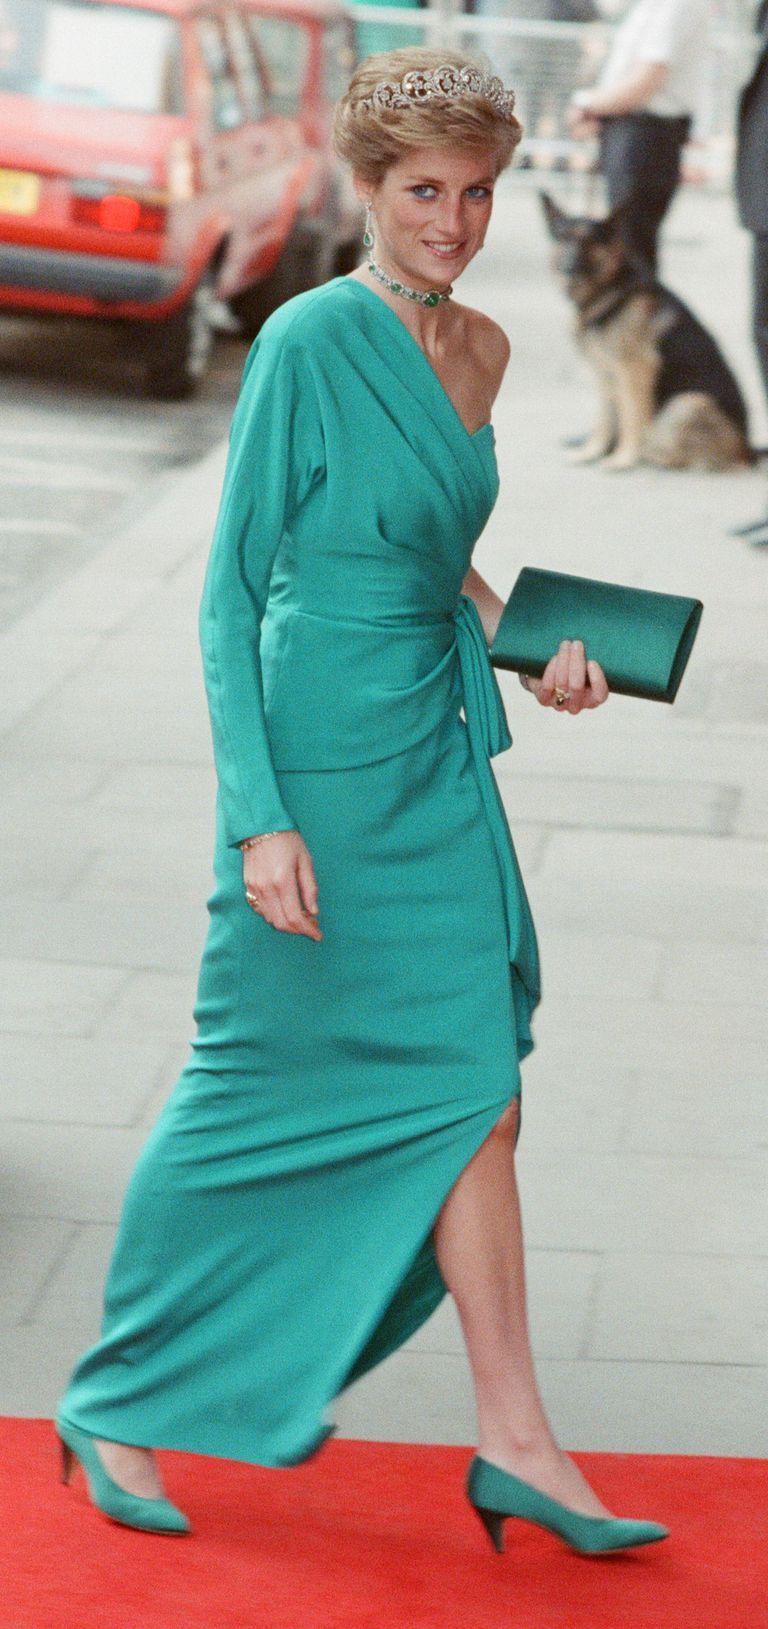 Princess Diana Was the Ultimate Royal Style Icon #princessdiana